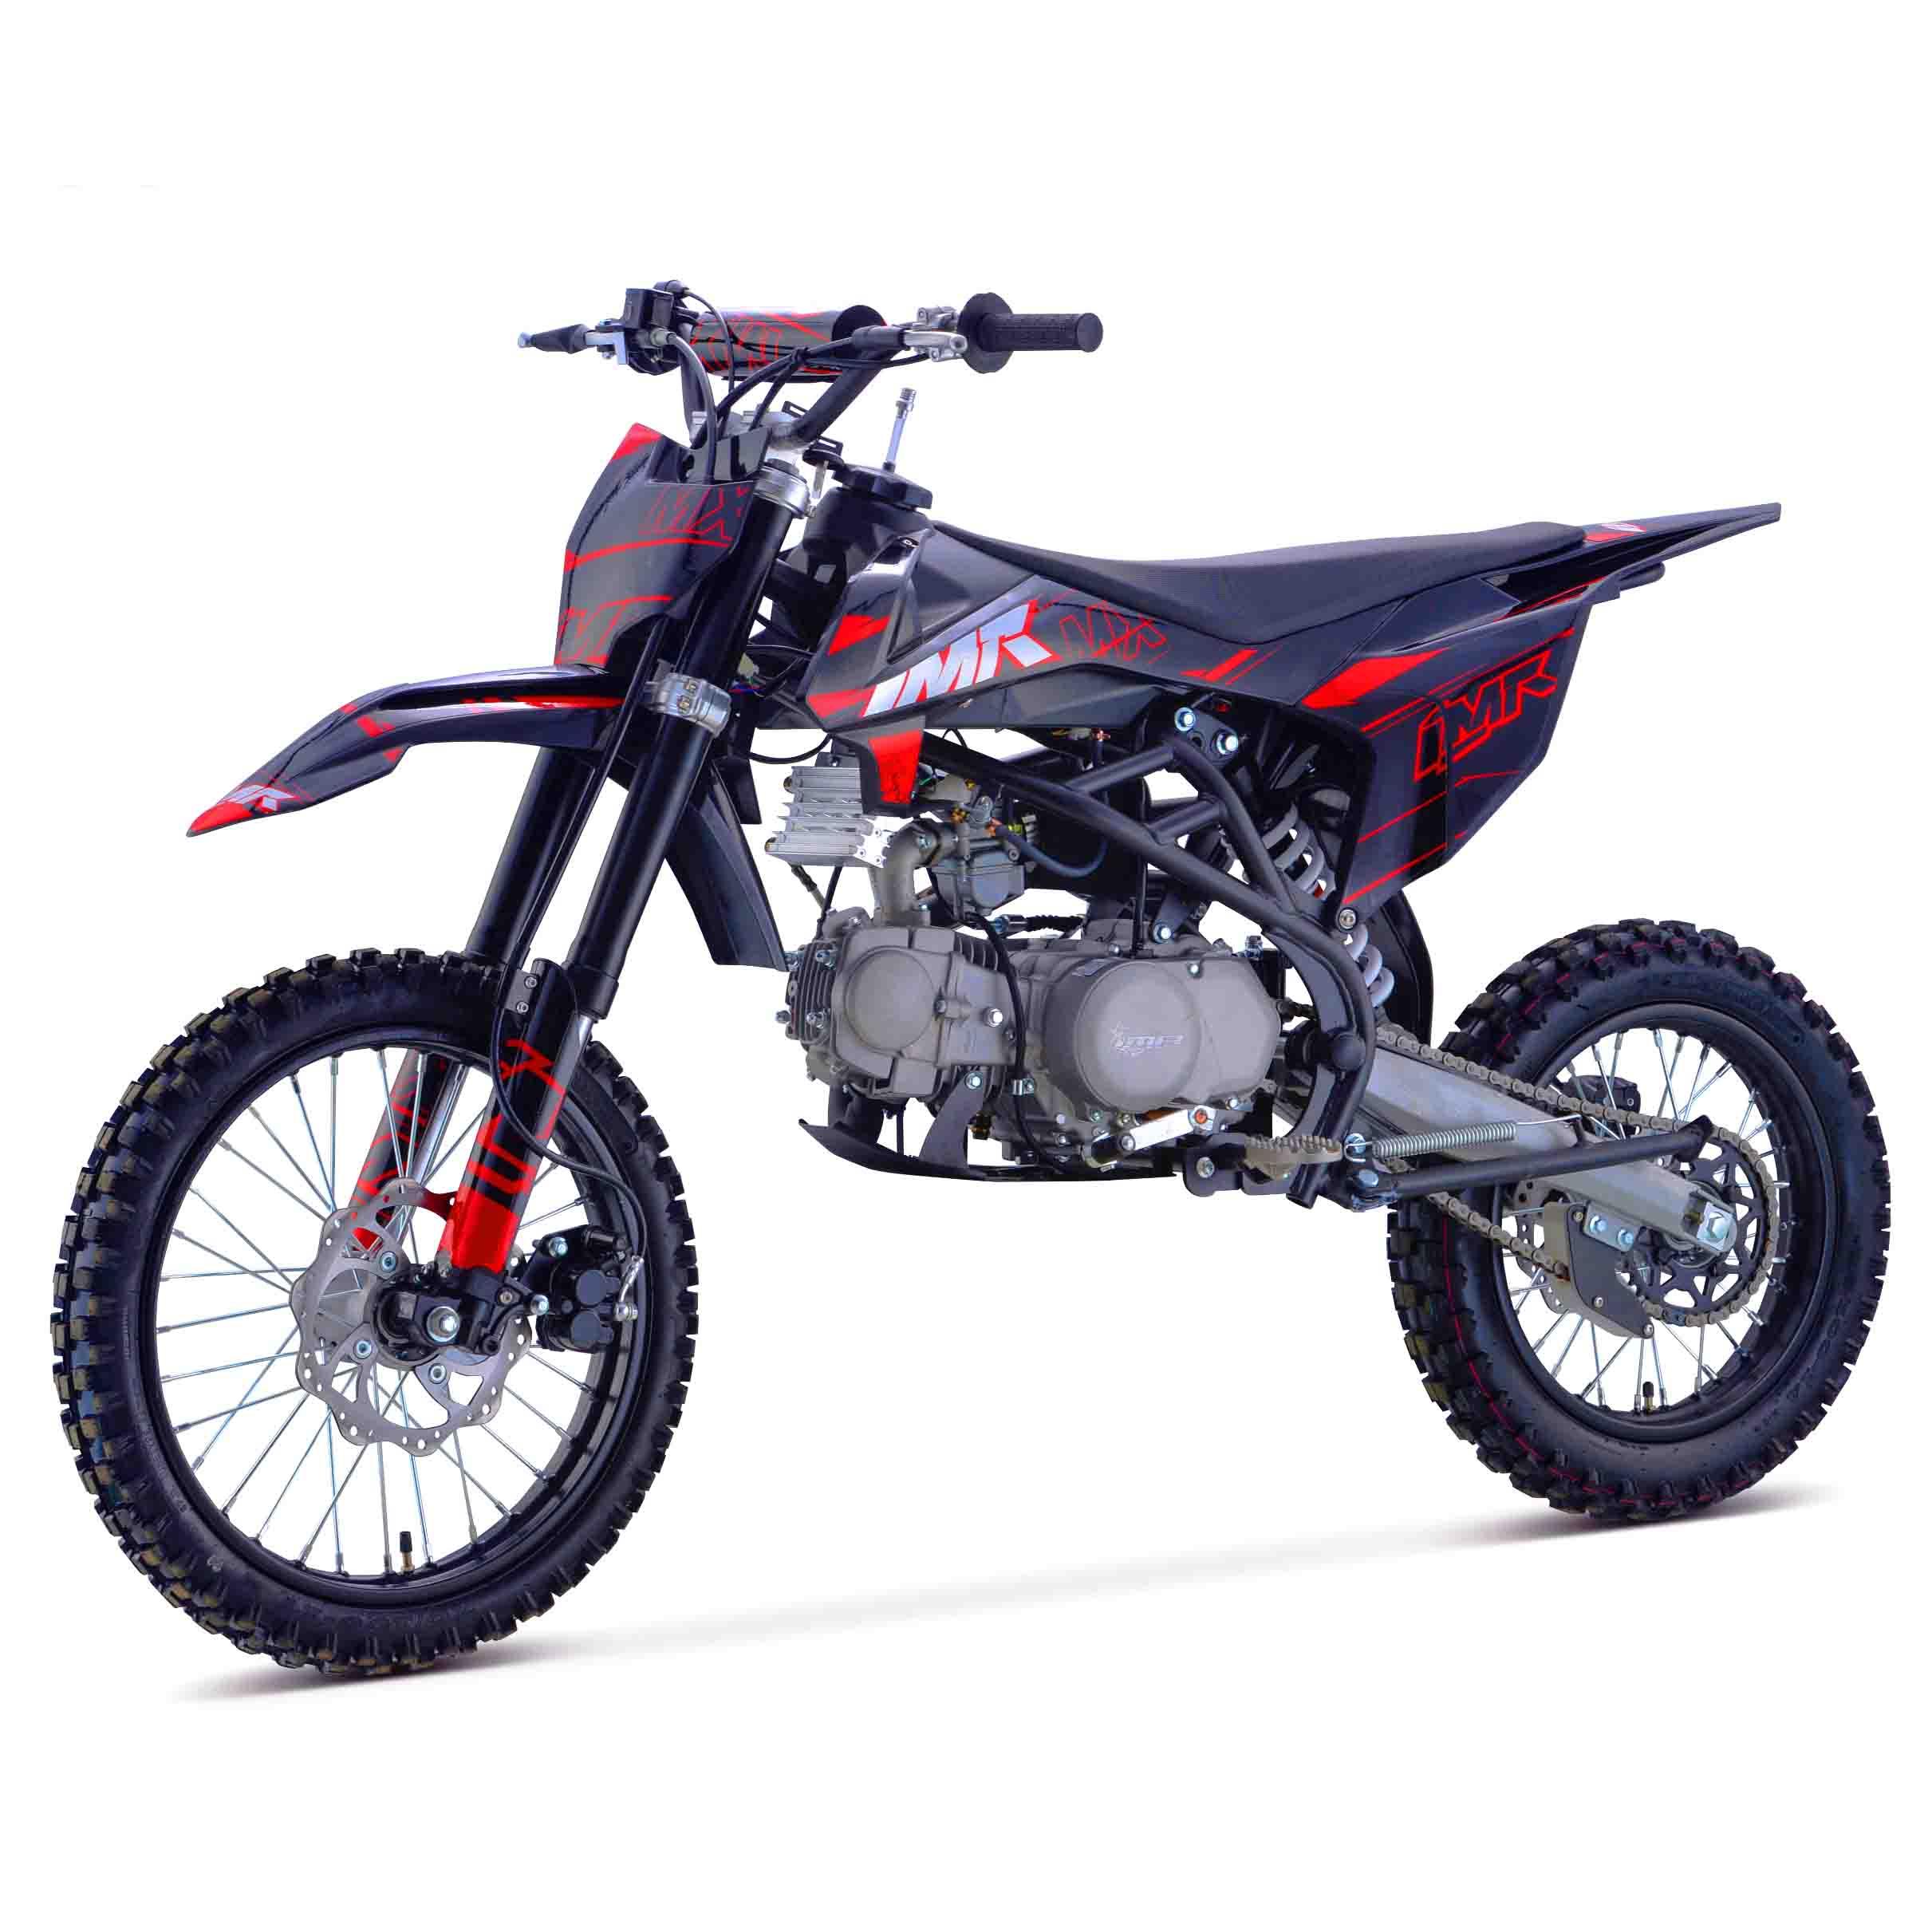 Pitbike-cross-imr-140-rojo-3.jpg